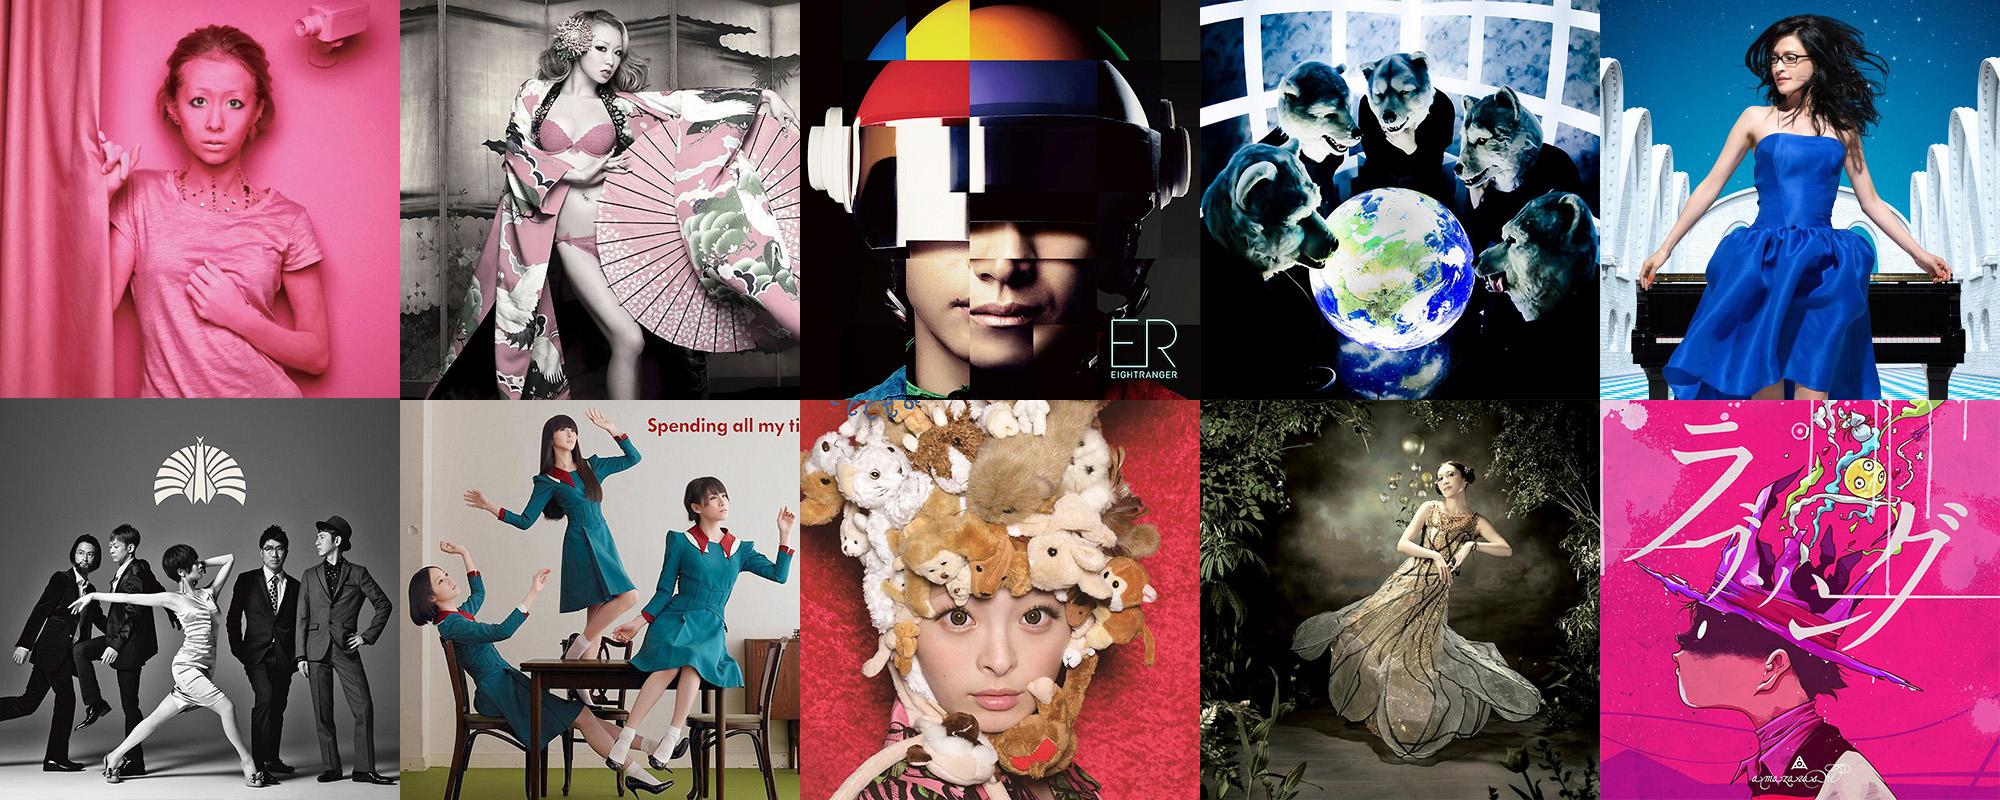 Best J-Pop J-Rock album covers 2012